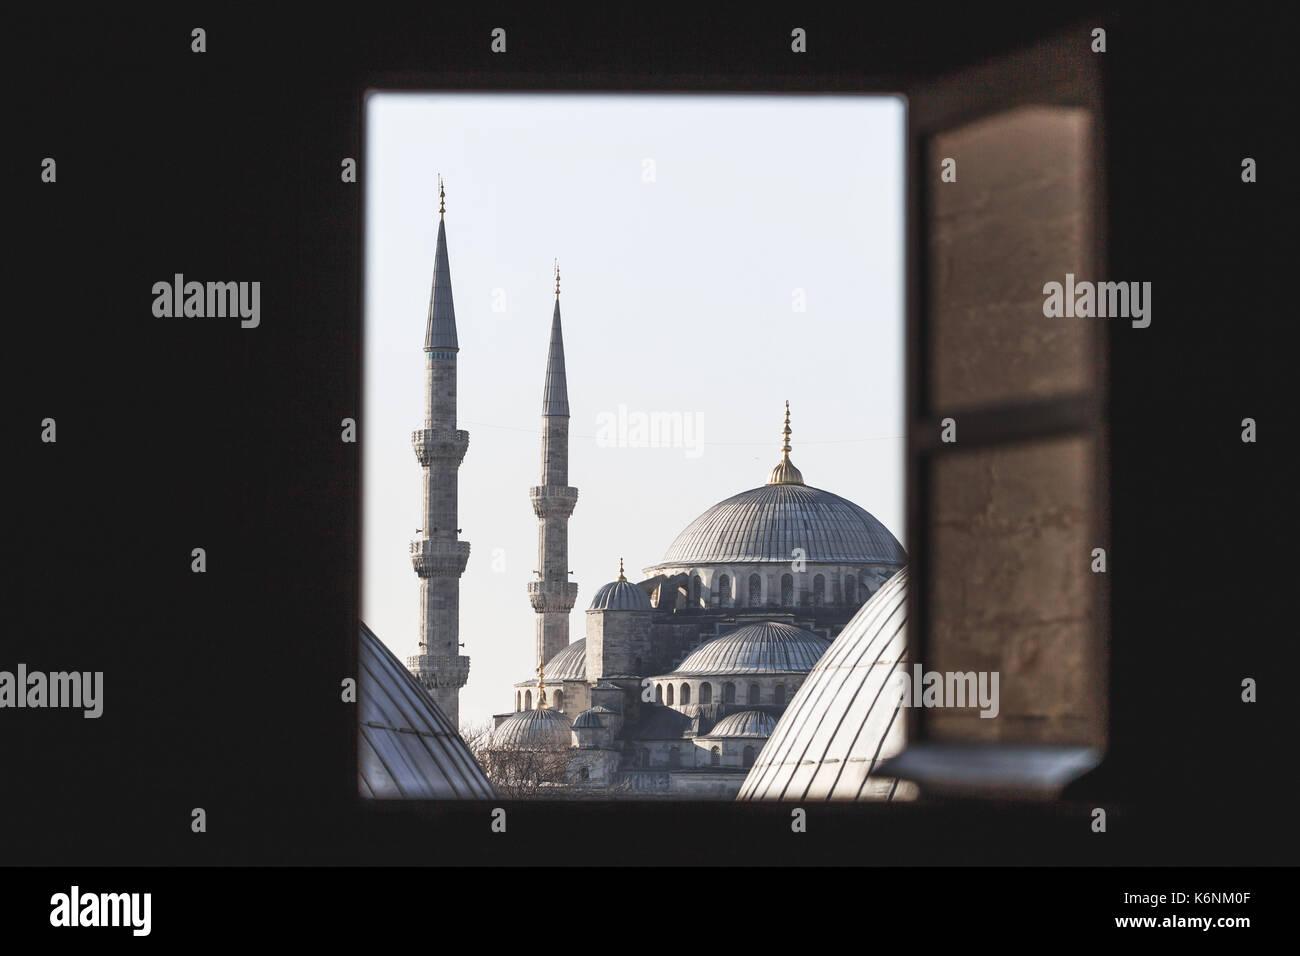 View of the Blue Mosque through the windows Hagia Sophia - Stock Image